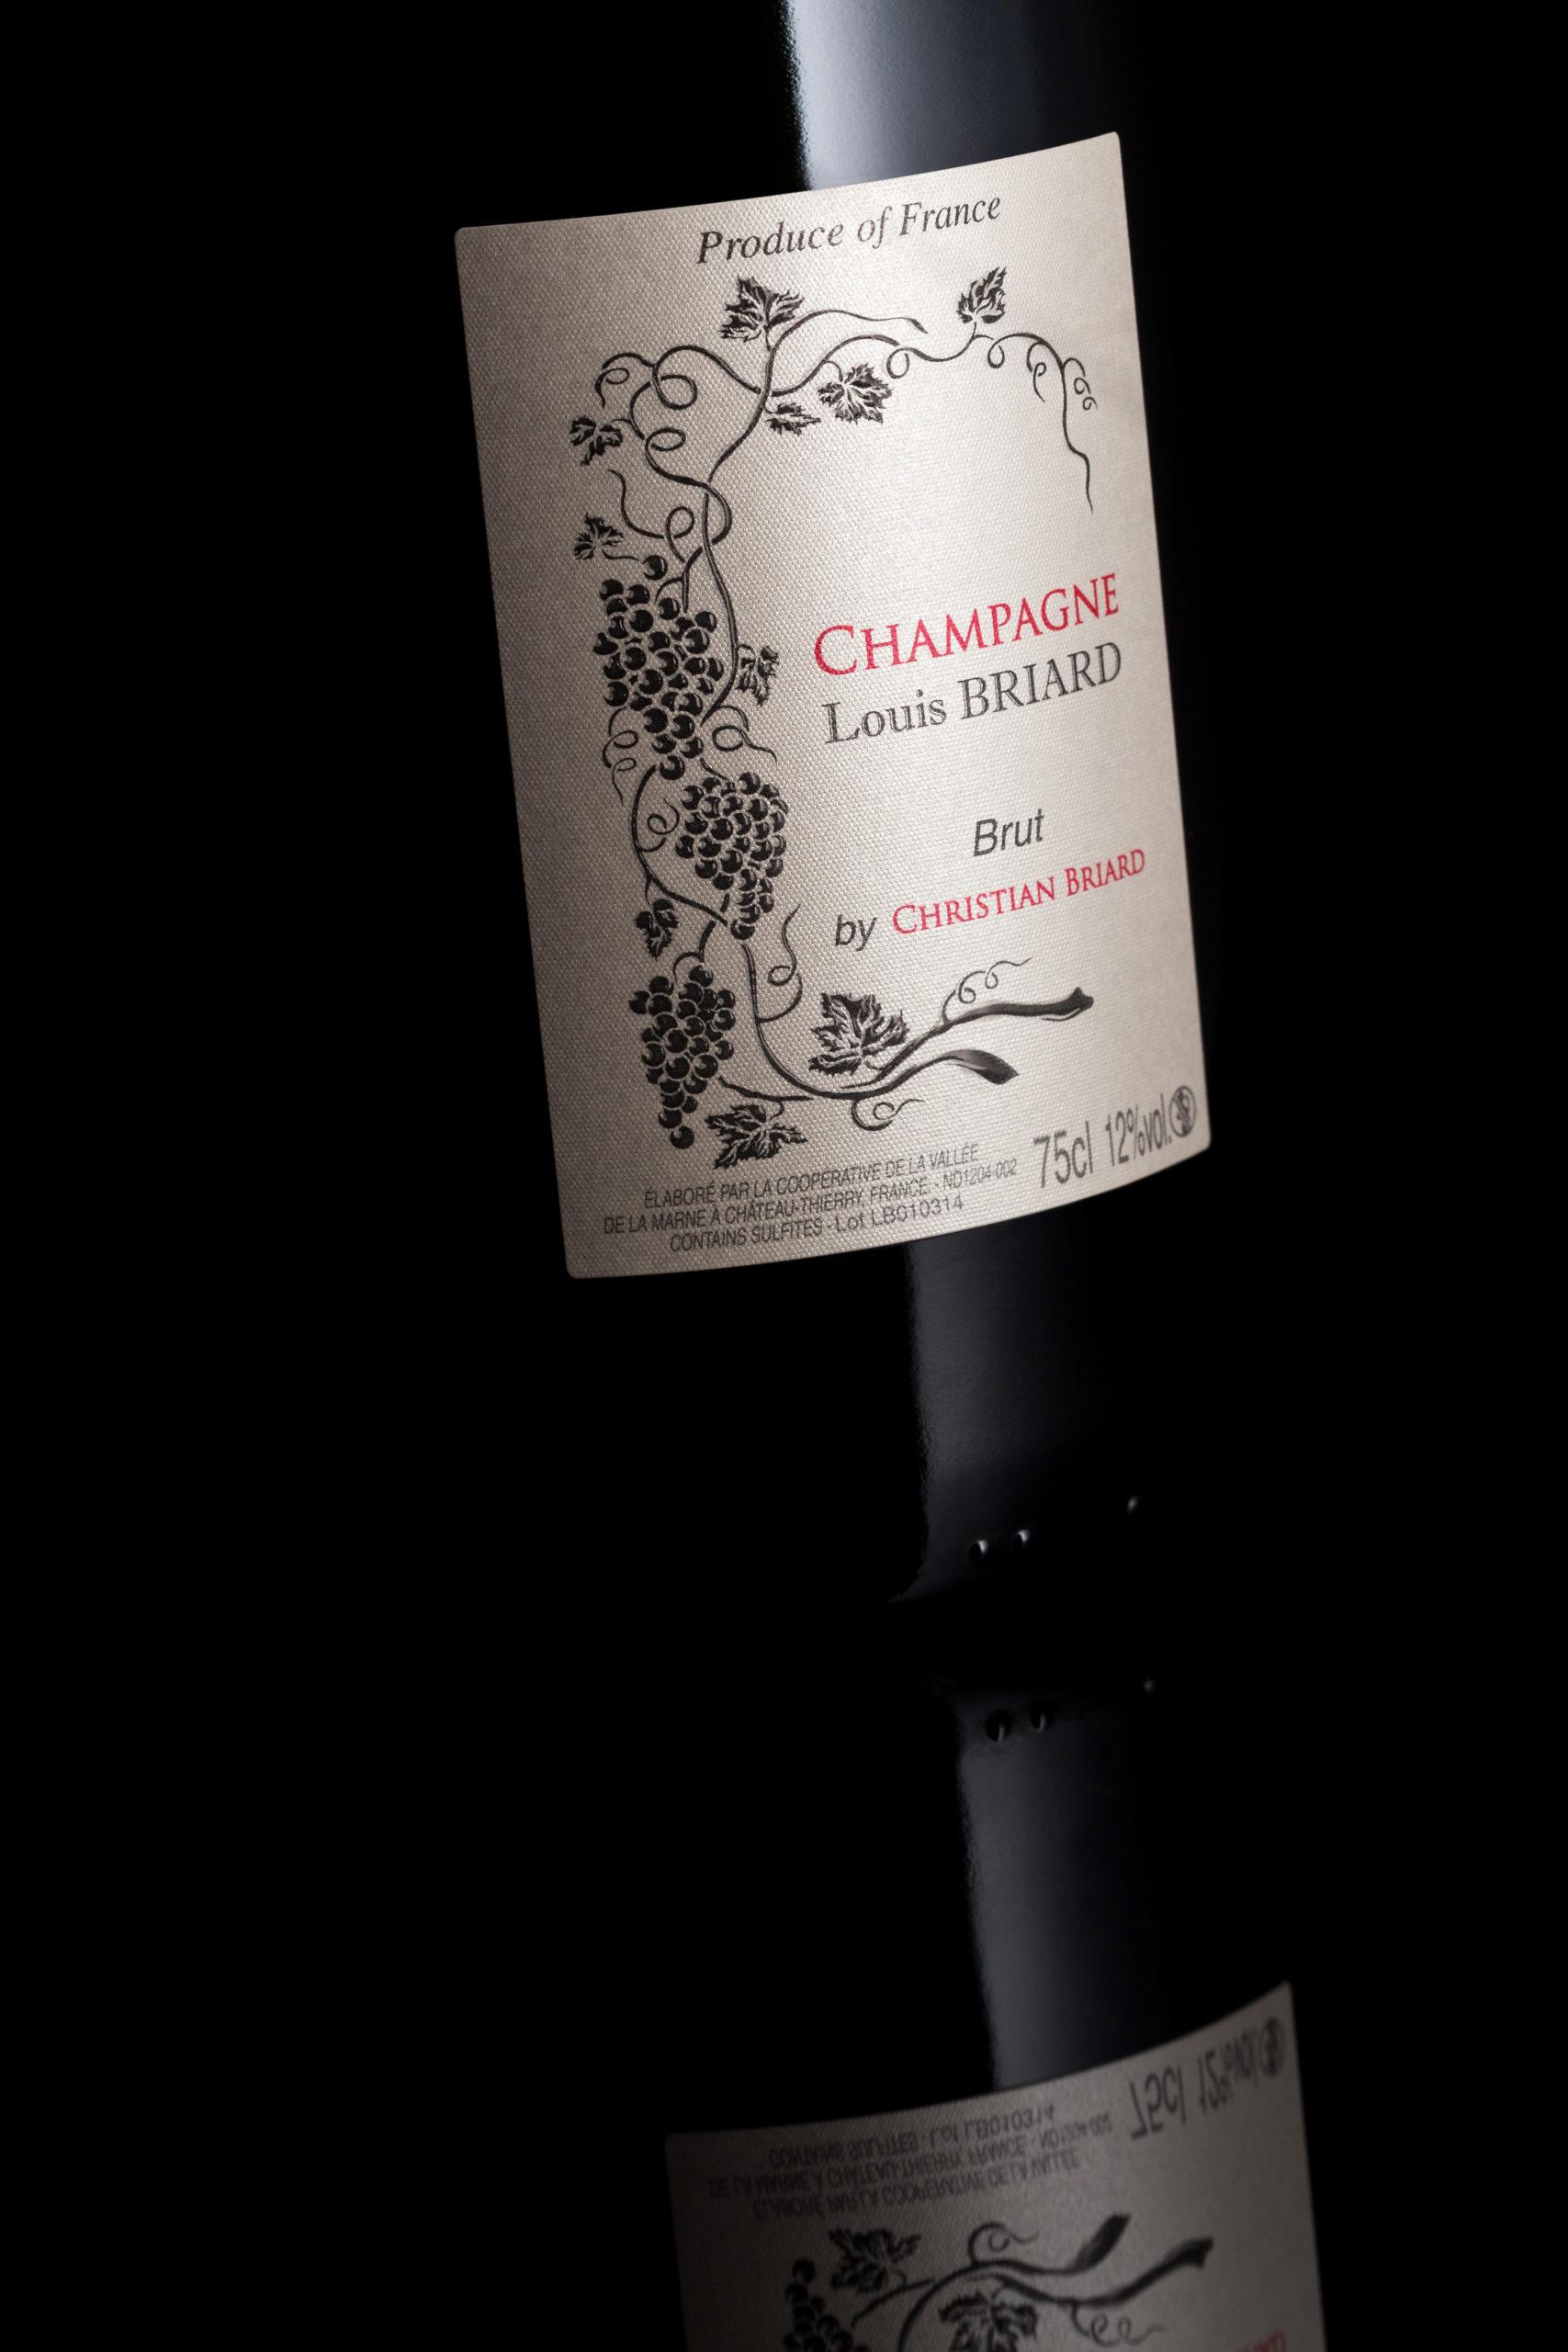 Champagne Louis Briard